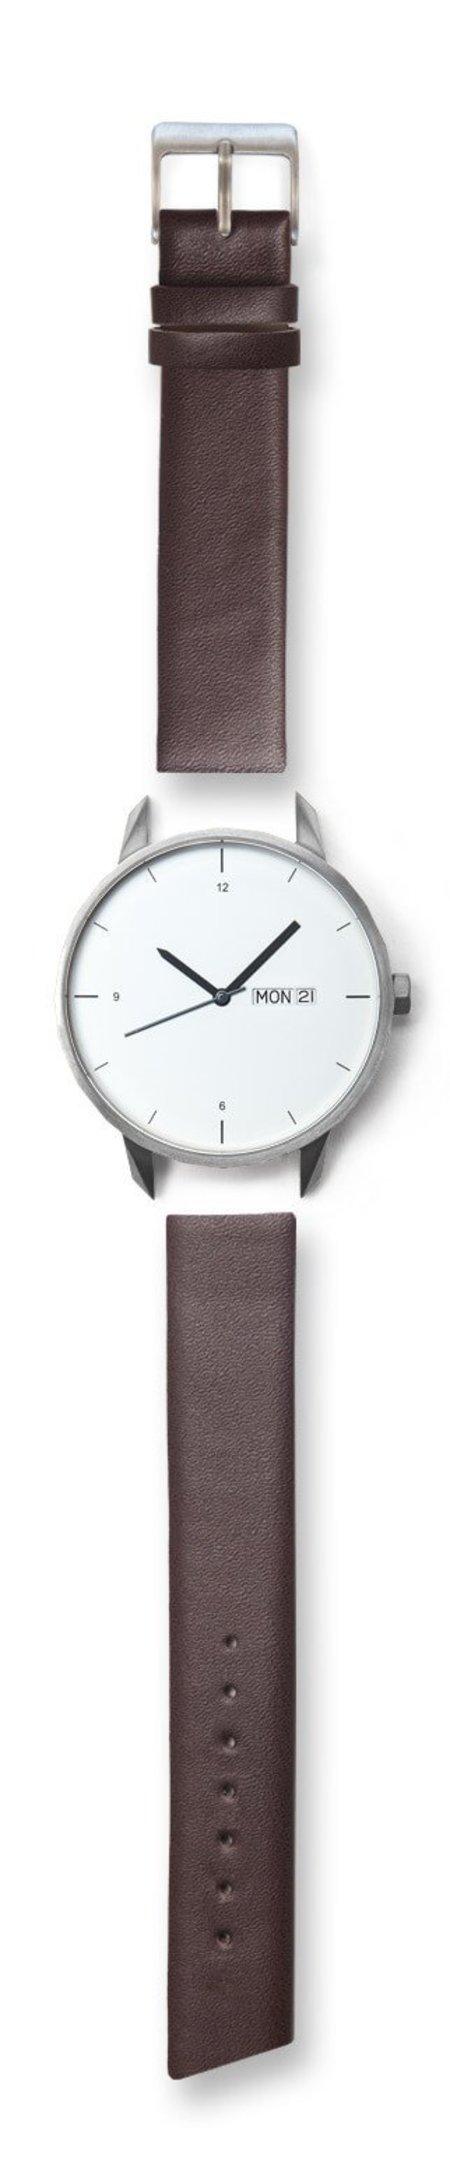 Unisex Tinker Watches 42mm Silver Watch Brown Strap